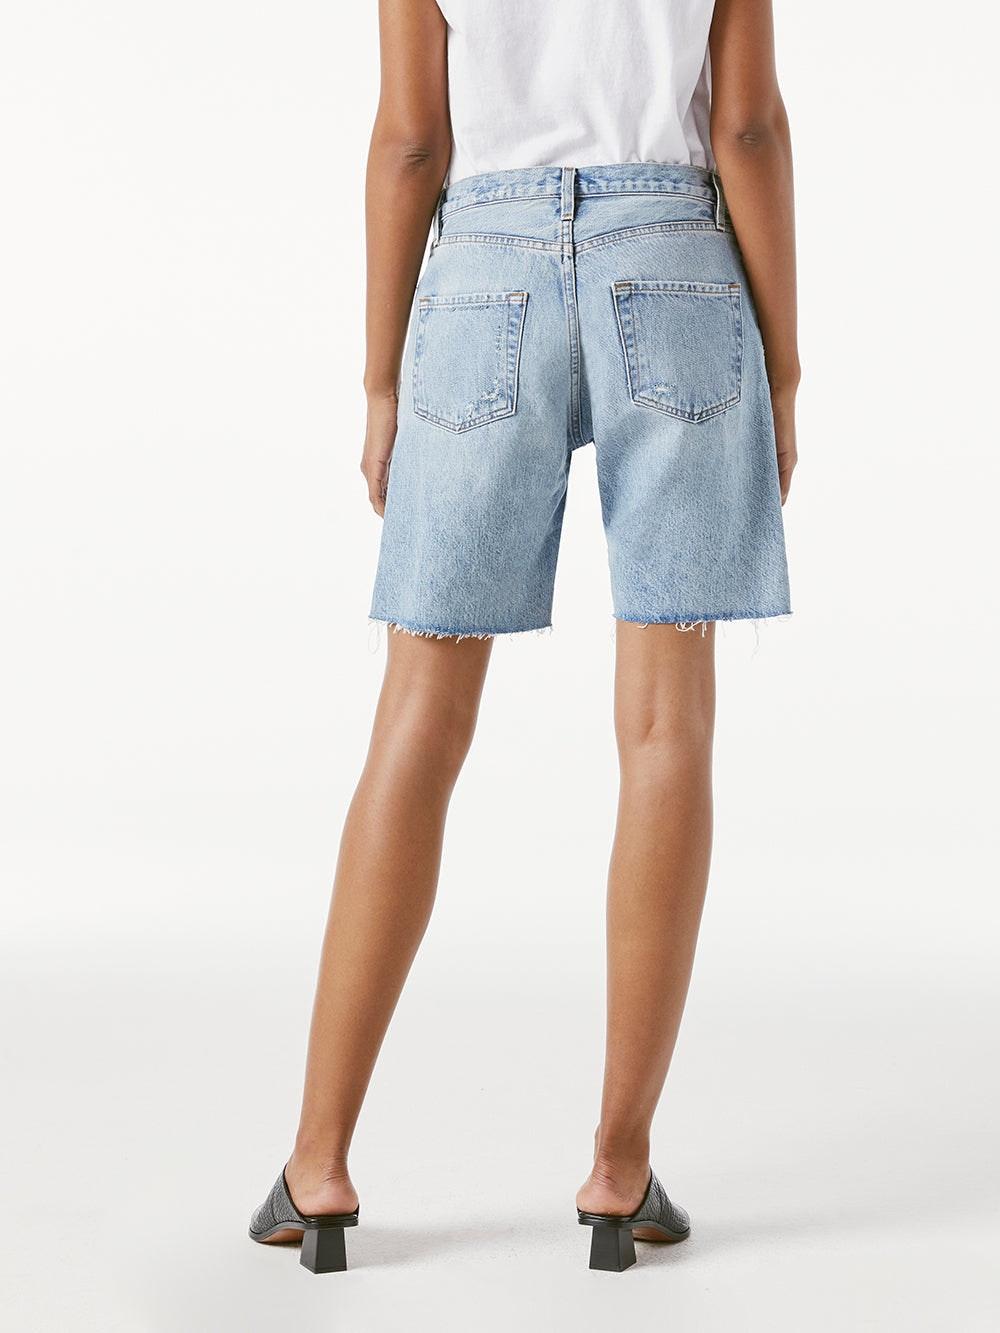 shorts back view 2